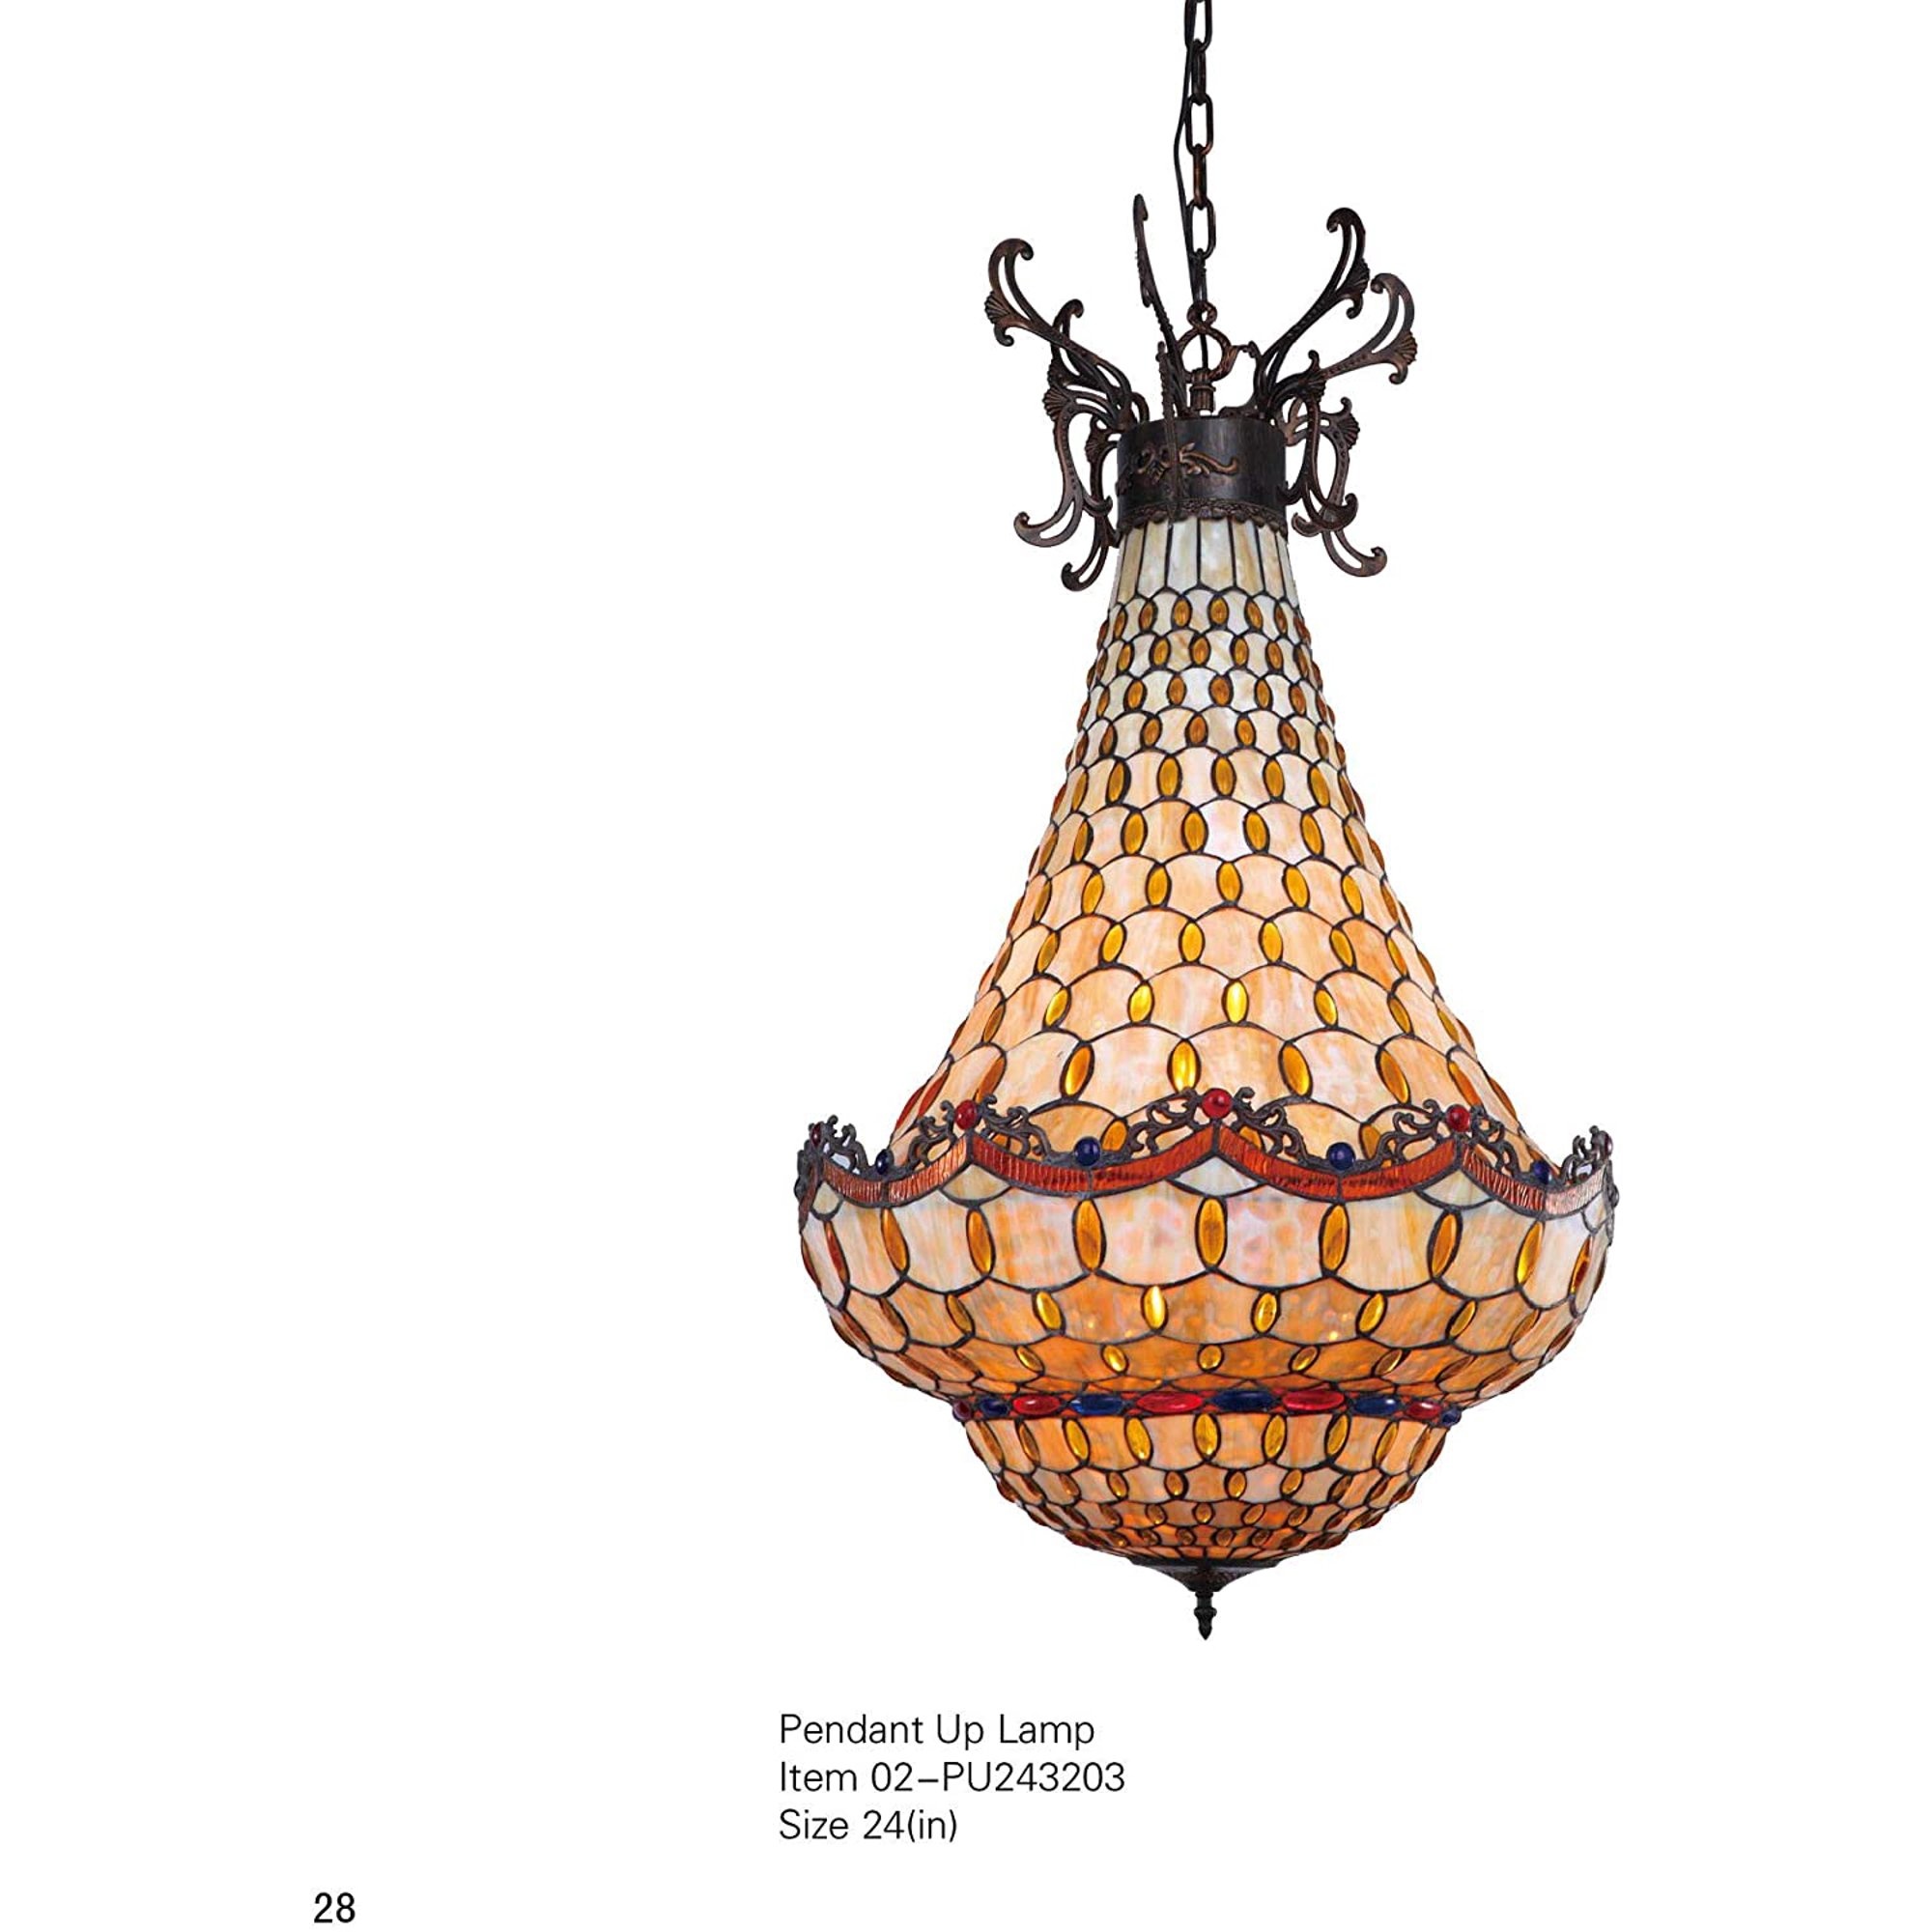 Viva Lifestyle Lighting Tiffany Style Victorian 6 Light E26 Ceiling Pendant Fixture Lights With 24 Inch Art Handmade Glass Shade Traditional Multi Colored Glass Chandelier Walmart Canada,Kids Designer Swimwear